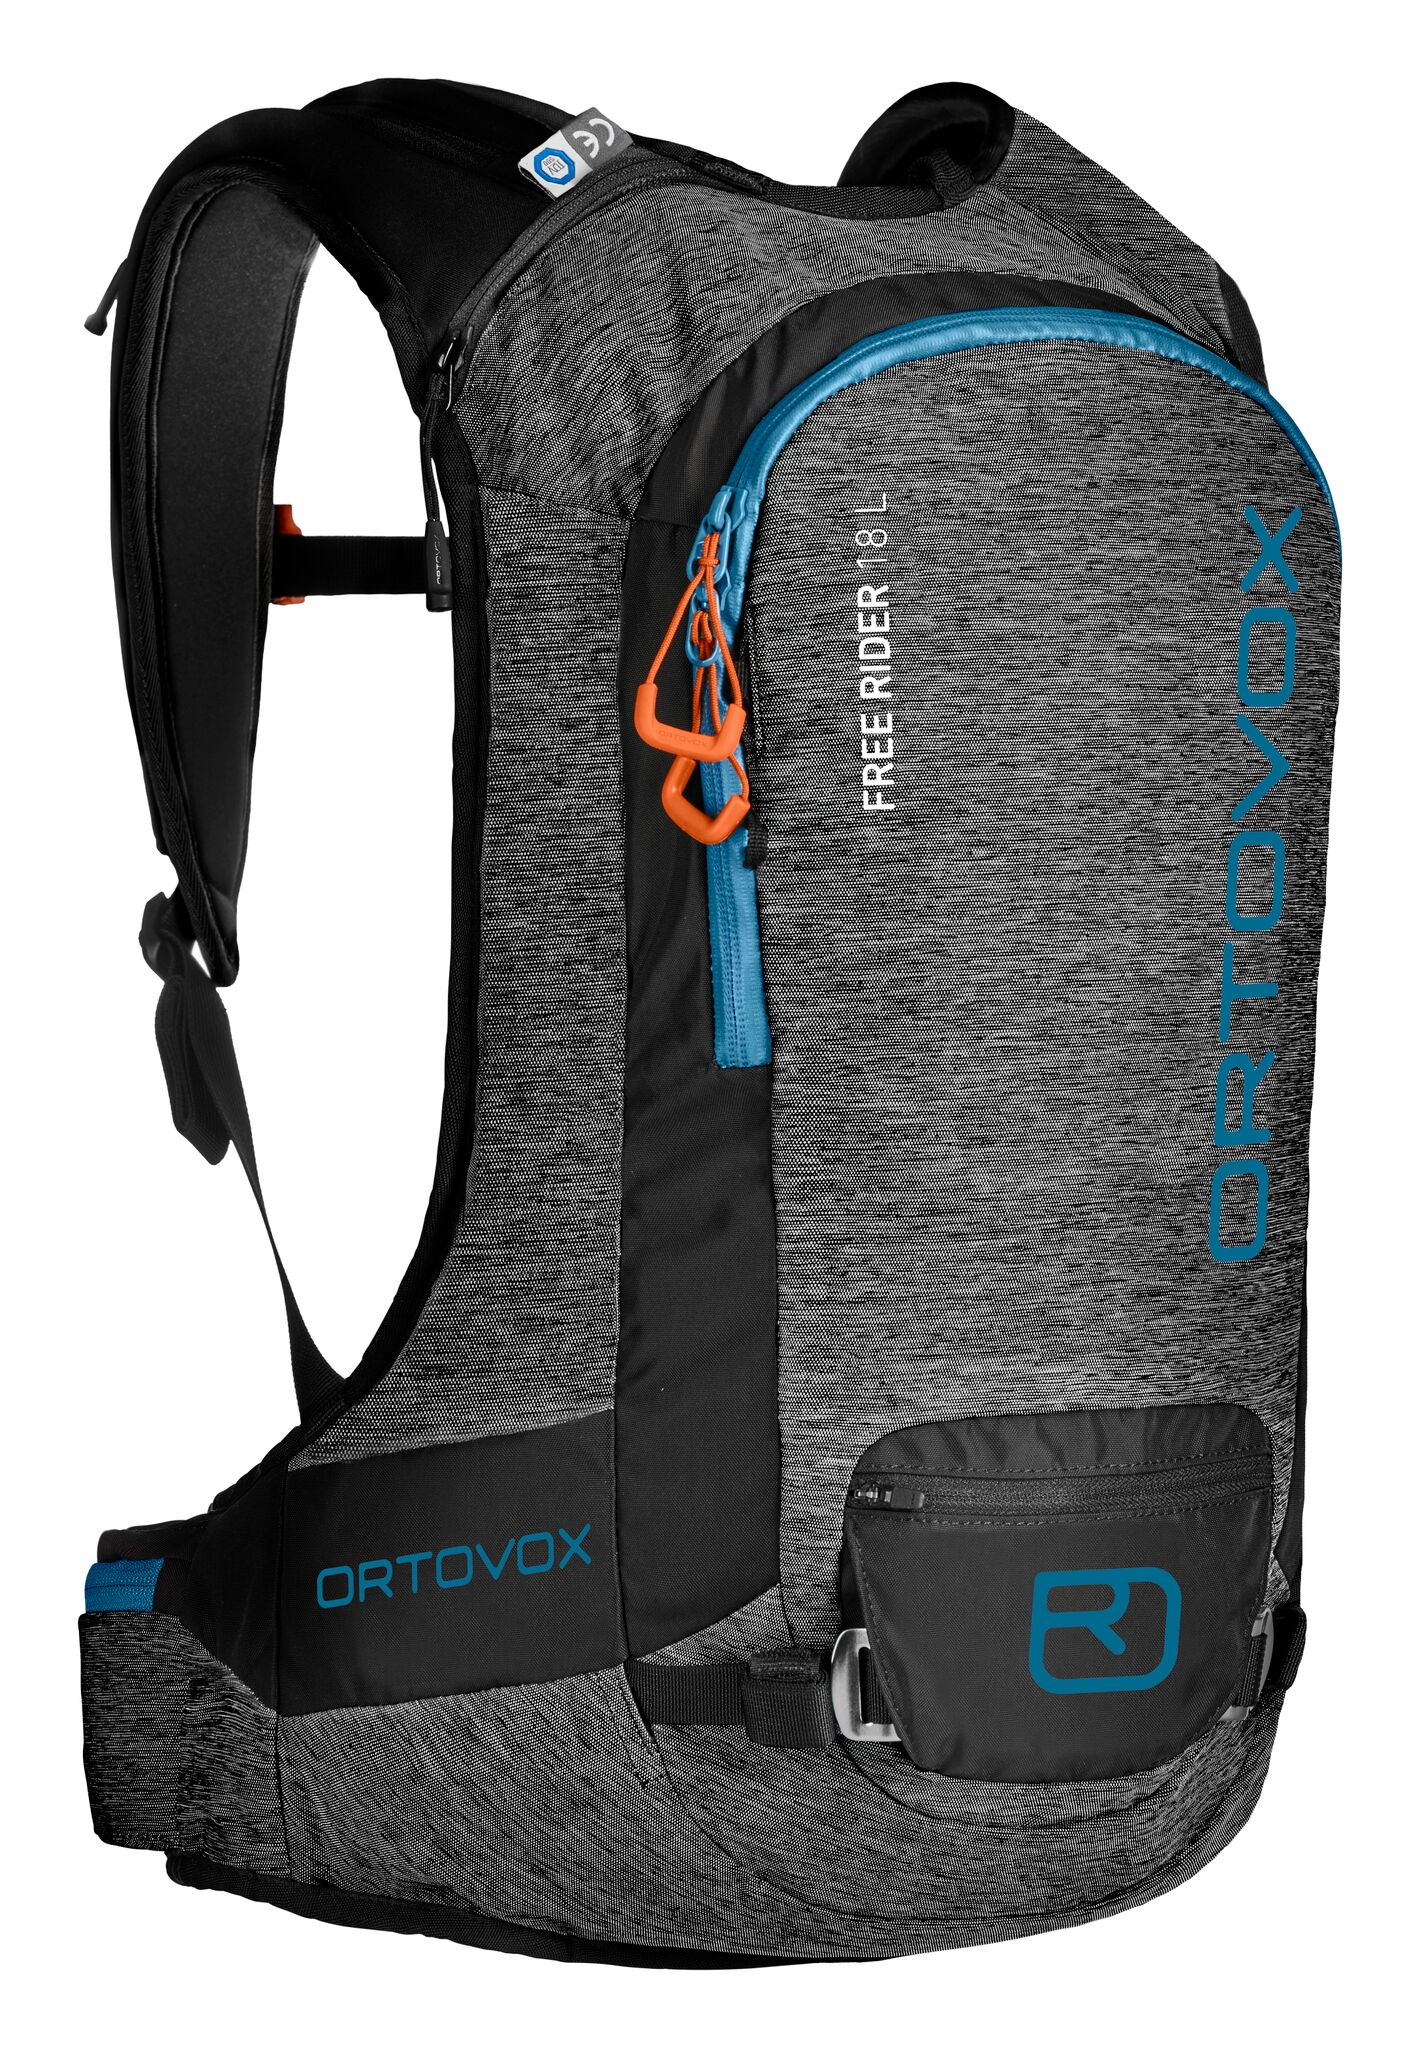 Ortovox Freerider 18L - Dark Grey Blend - Front View